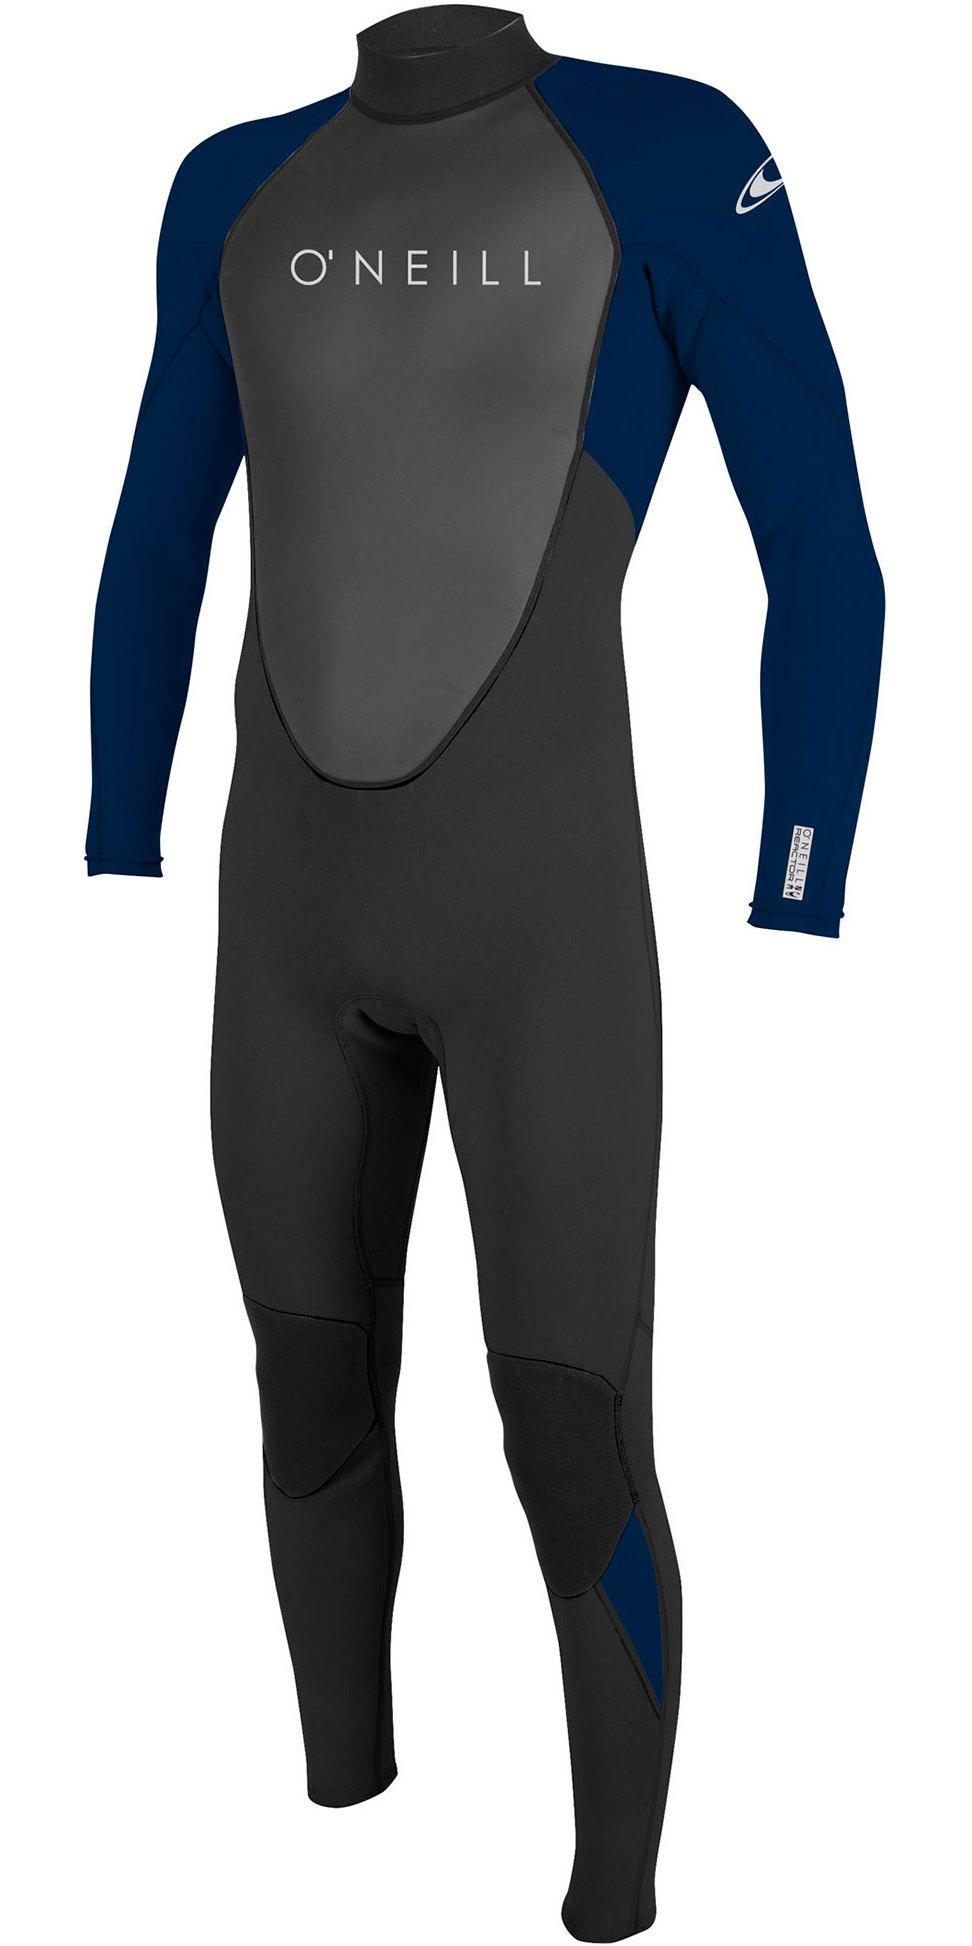 2020 O'Neill Mens Reactor II 3/2mm Back Zip Wetsuit Black / Abyss 5040